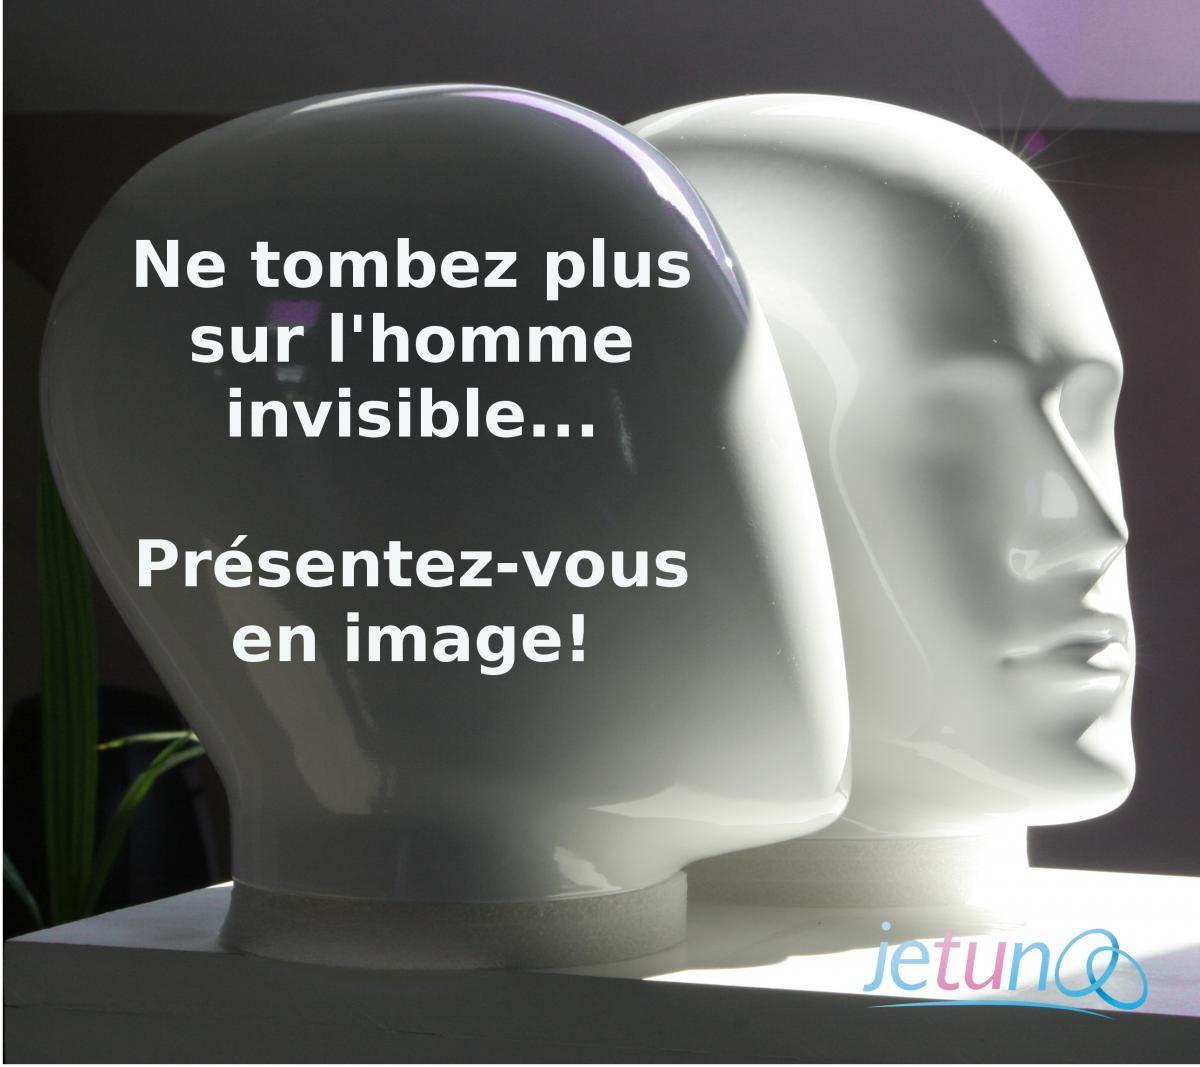 Site de rencontres guadeloupe picture 4